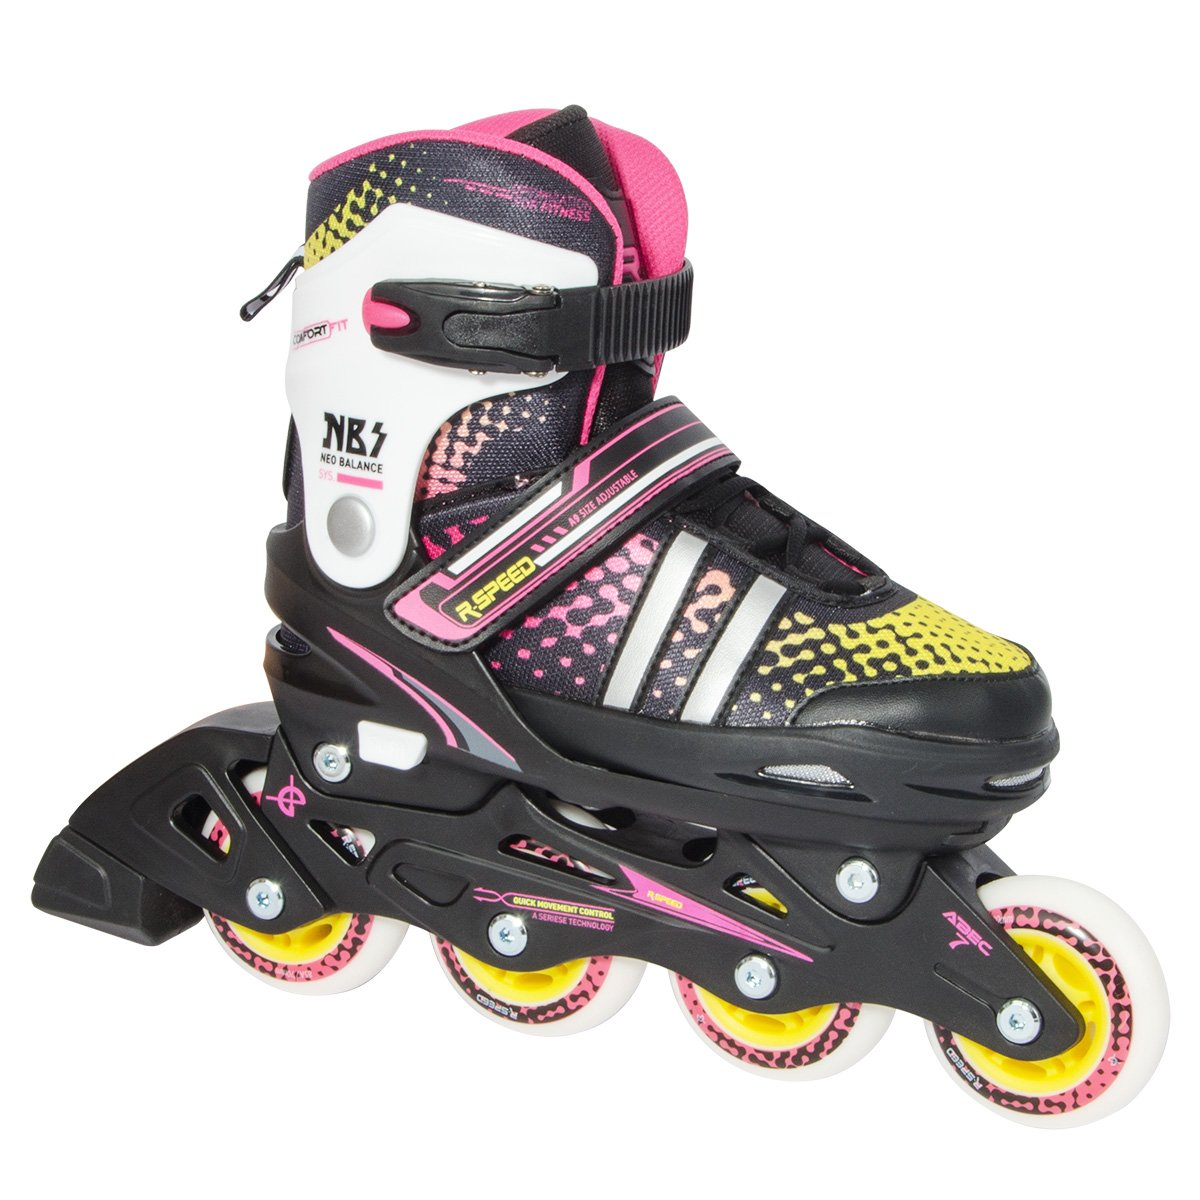 R-SPEED Adjustable Inline Skate Beginner Training Skates Junior Durable Rollerblades - Kids,Adults,Boys,Girls,Womens -Outdoor Practice Recreation by R-SPEED